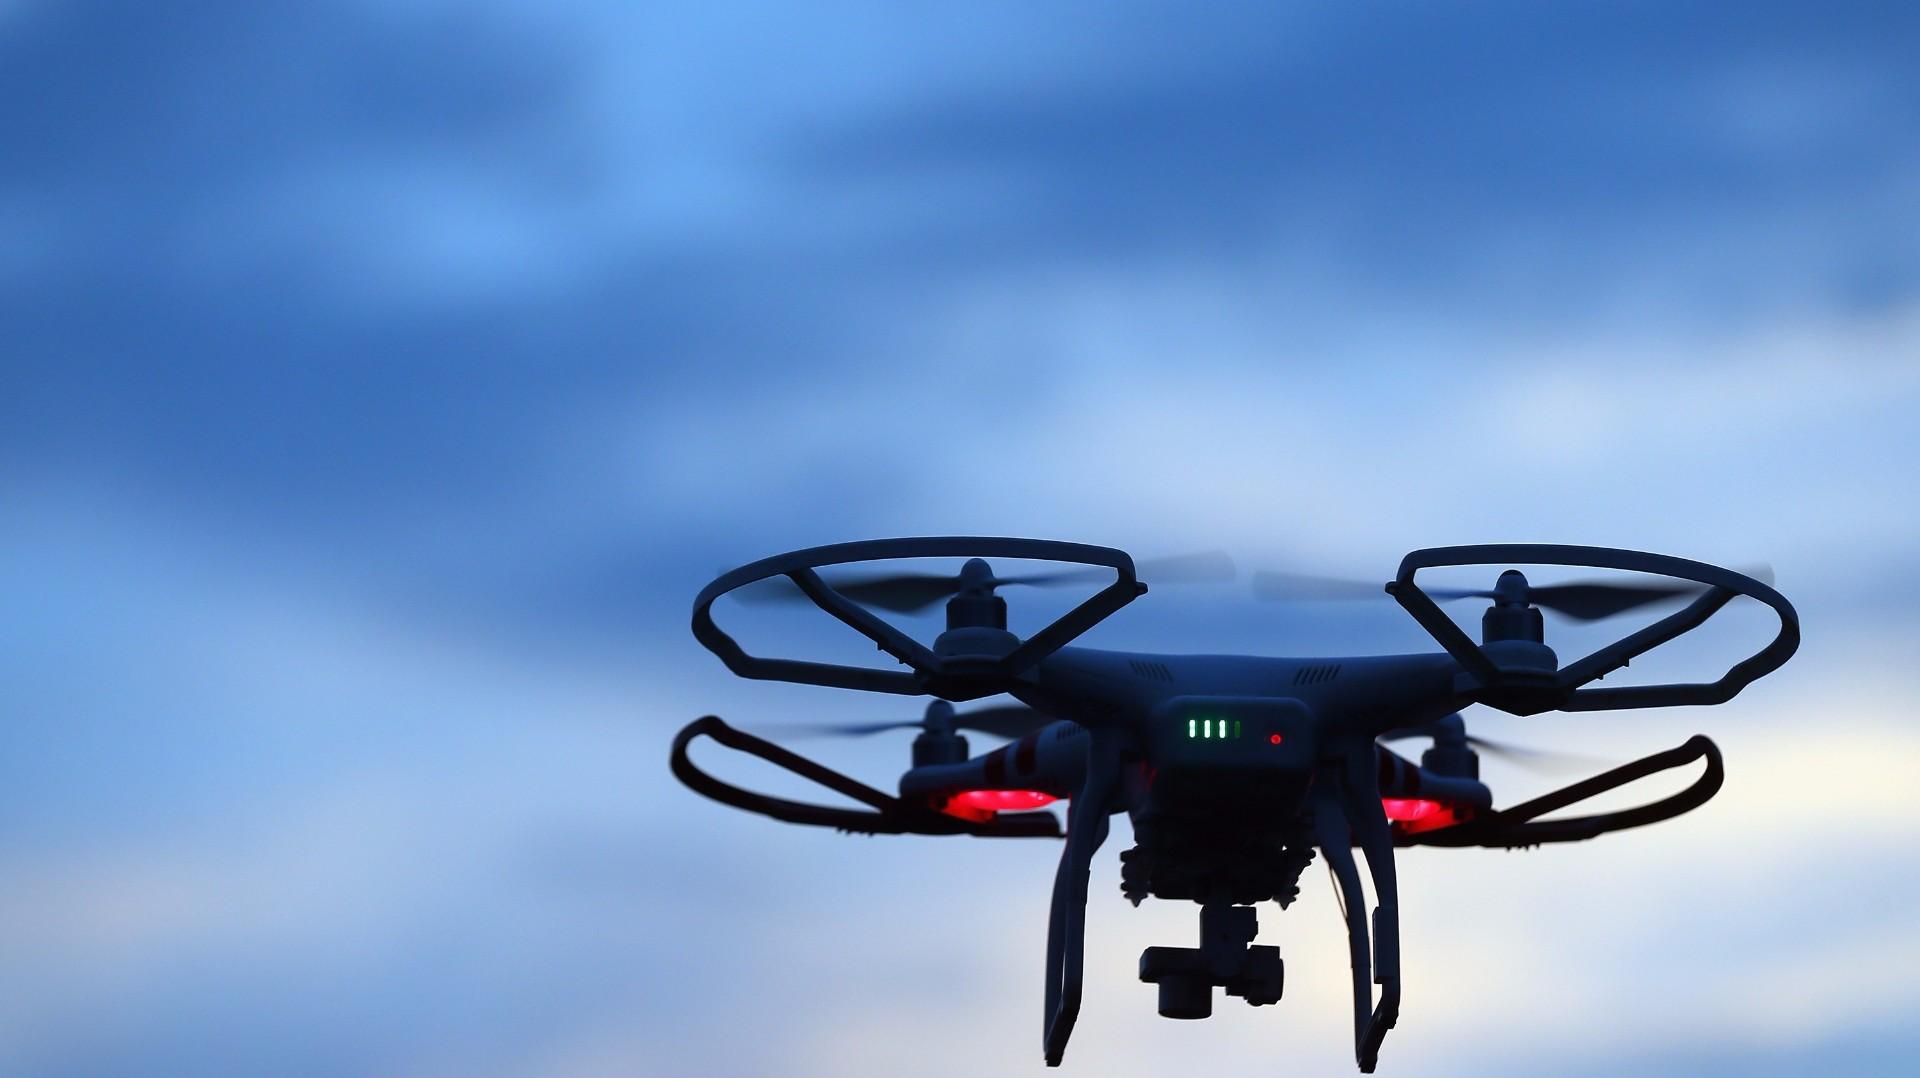 Drone_1485967864782_8001229_ver1.0.jpg